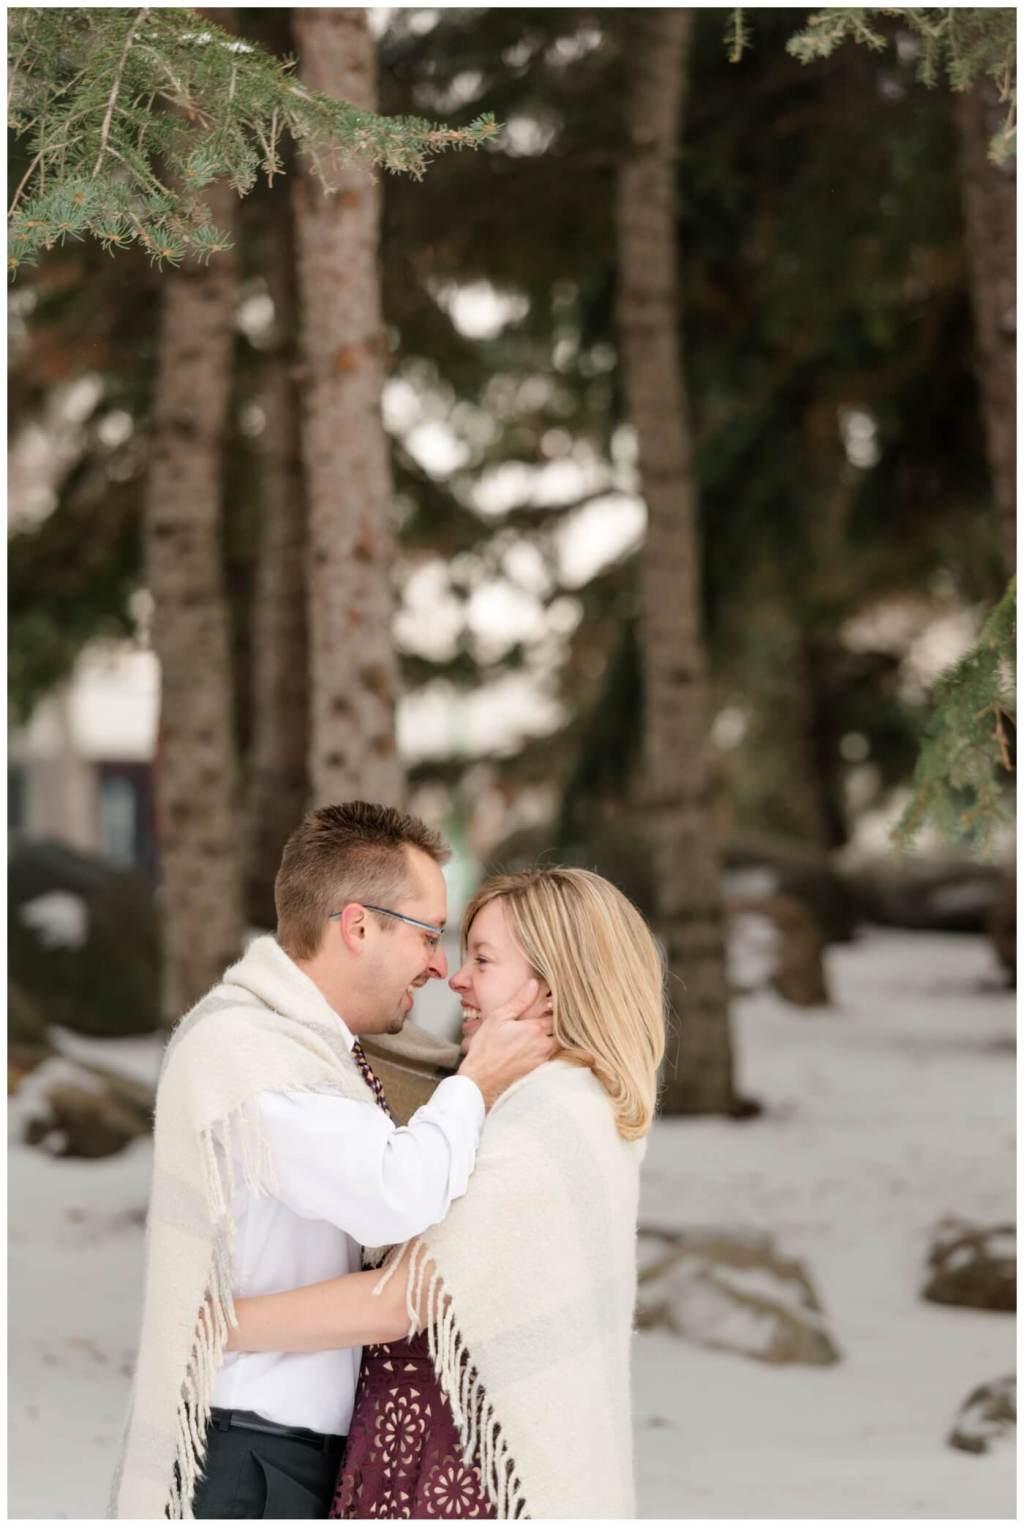 Regina Engagement Photographer - Dave-Sarah - Winter Engagement Session - Kiwanis Park Regina- Snow - Pine Trees